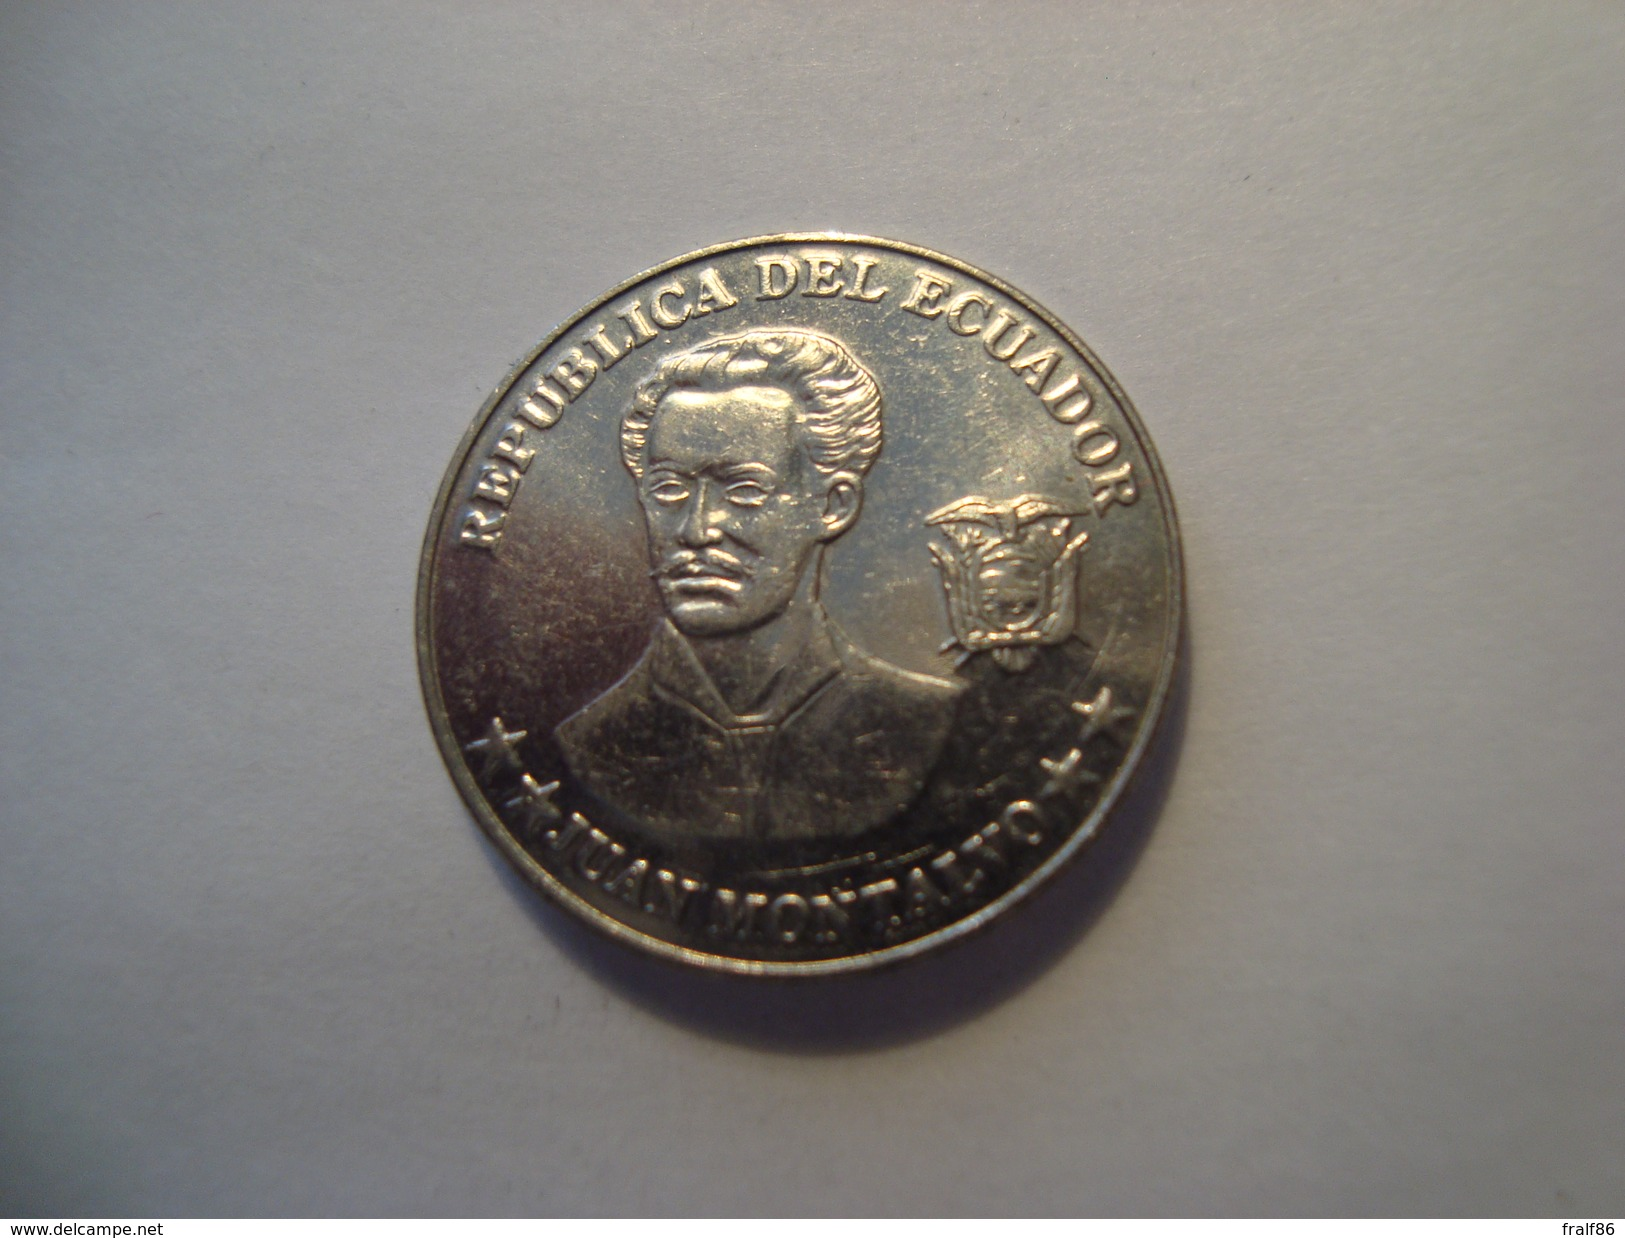 MONNAIE EQUATEUR 5 CENTAVOS 2000 - Ecuador